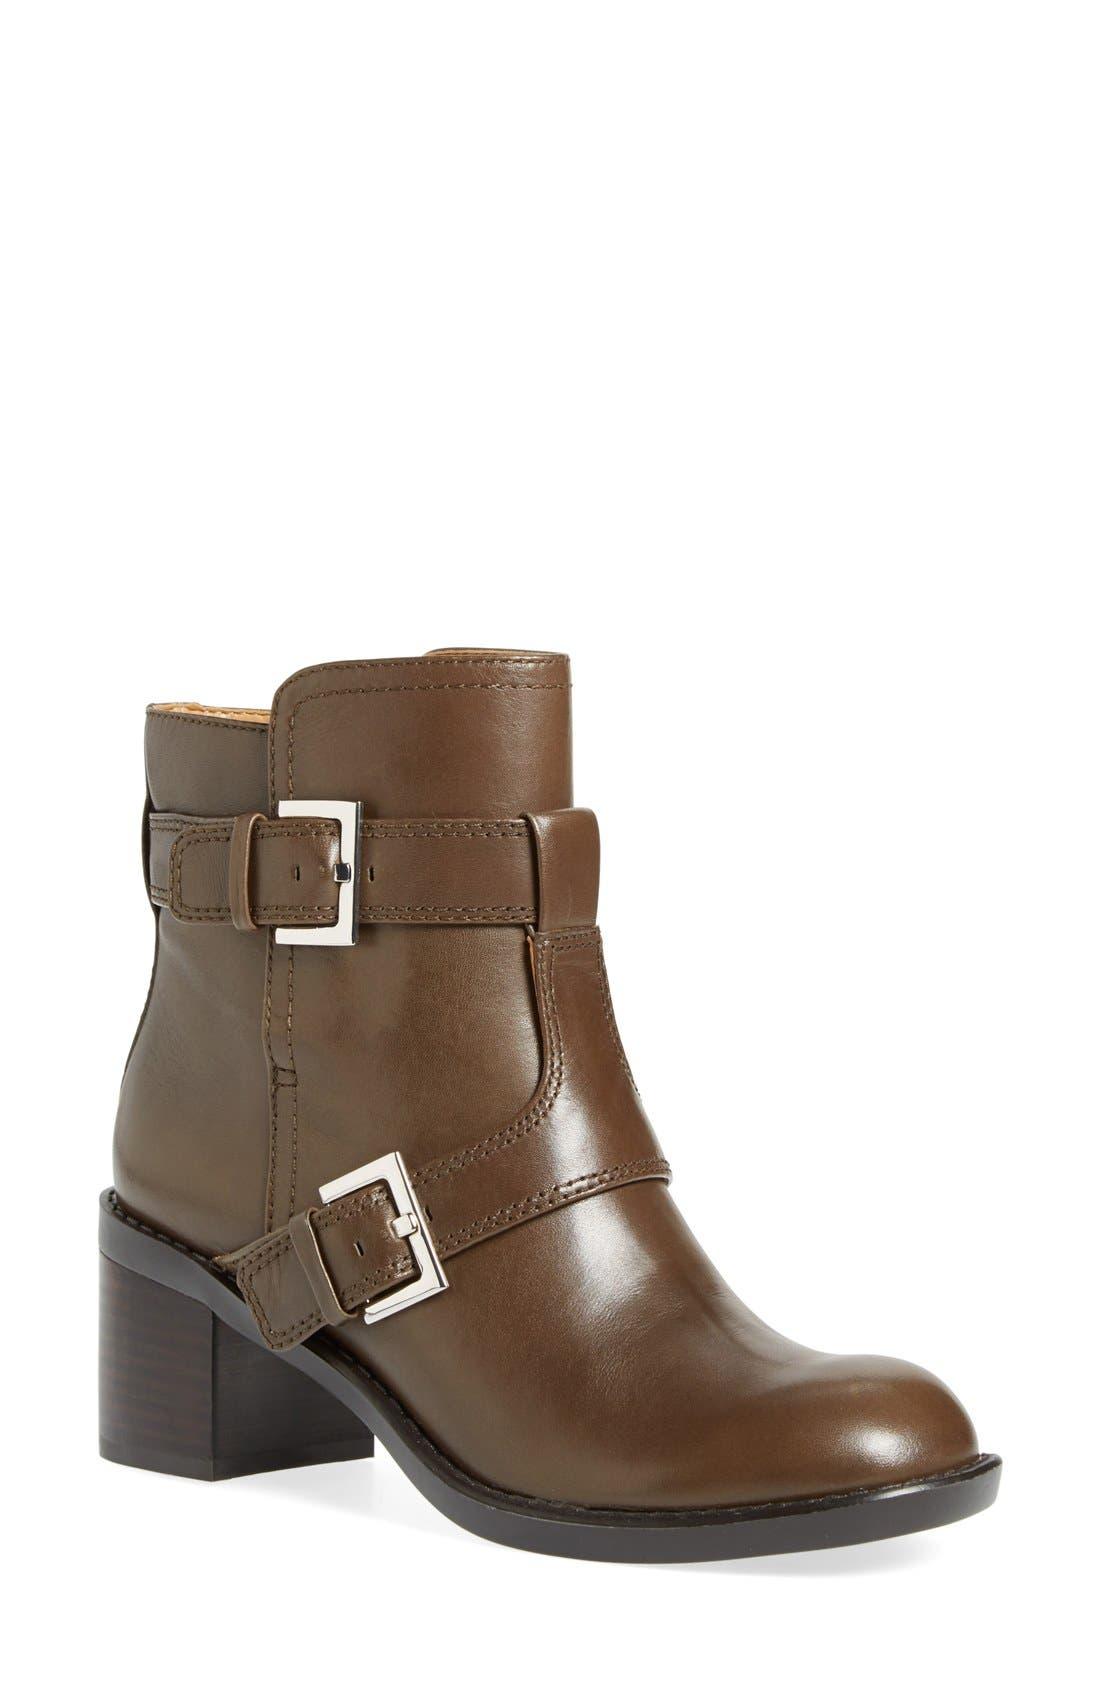 Main Image - Nine West 'Lorena' Buckle Mid Boot (Women)